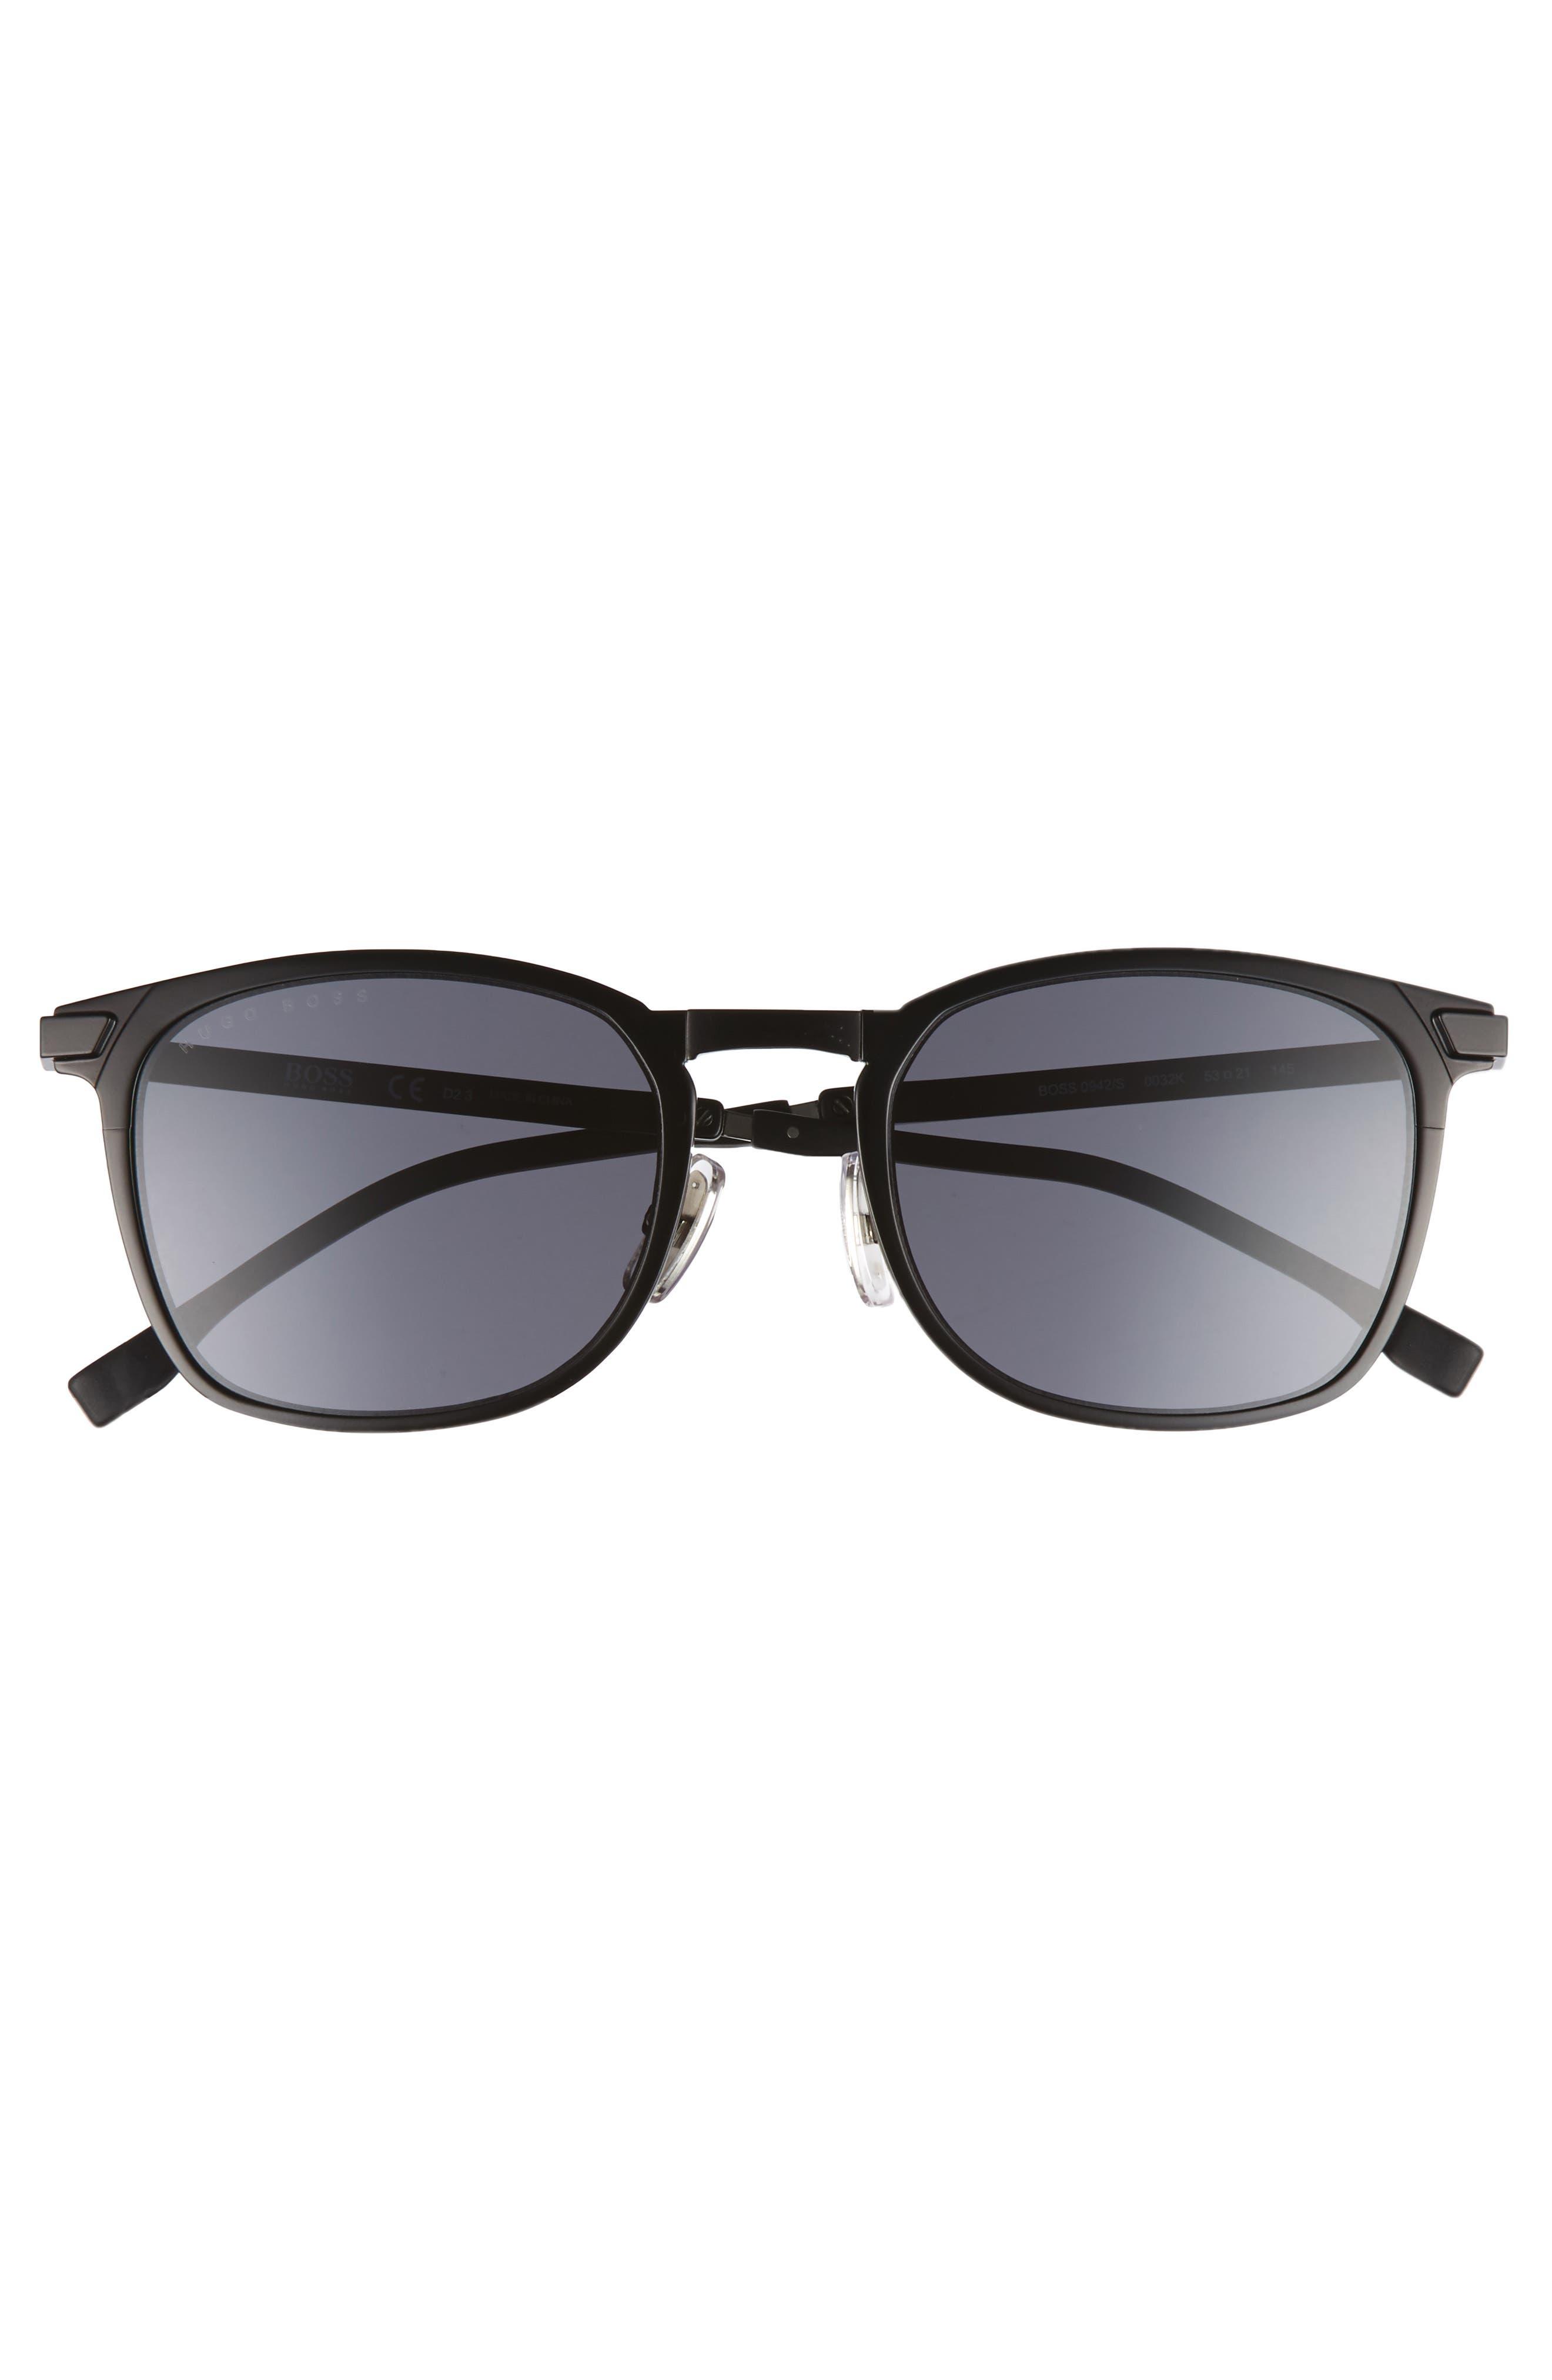 53mm Sunglasses,                             Alternate thumbnail 2, color,                             Matte Black/ Gray